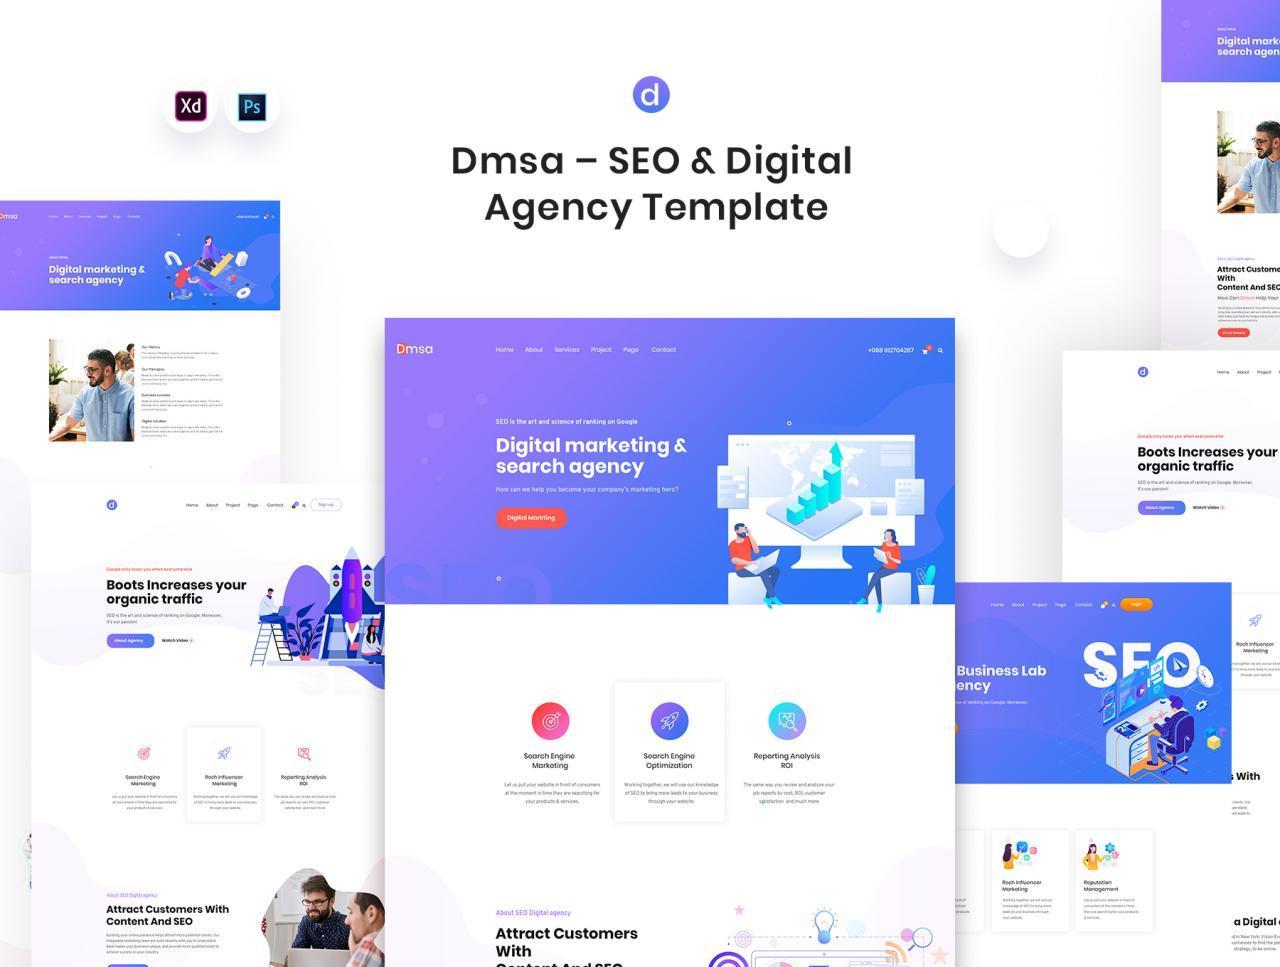 SEO优化WEB企业网站UI界面设计模板套件 Dmsa – SEO & Digital Agency Template插图